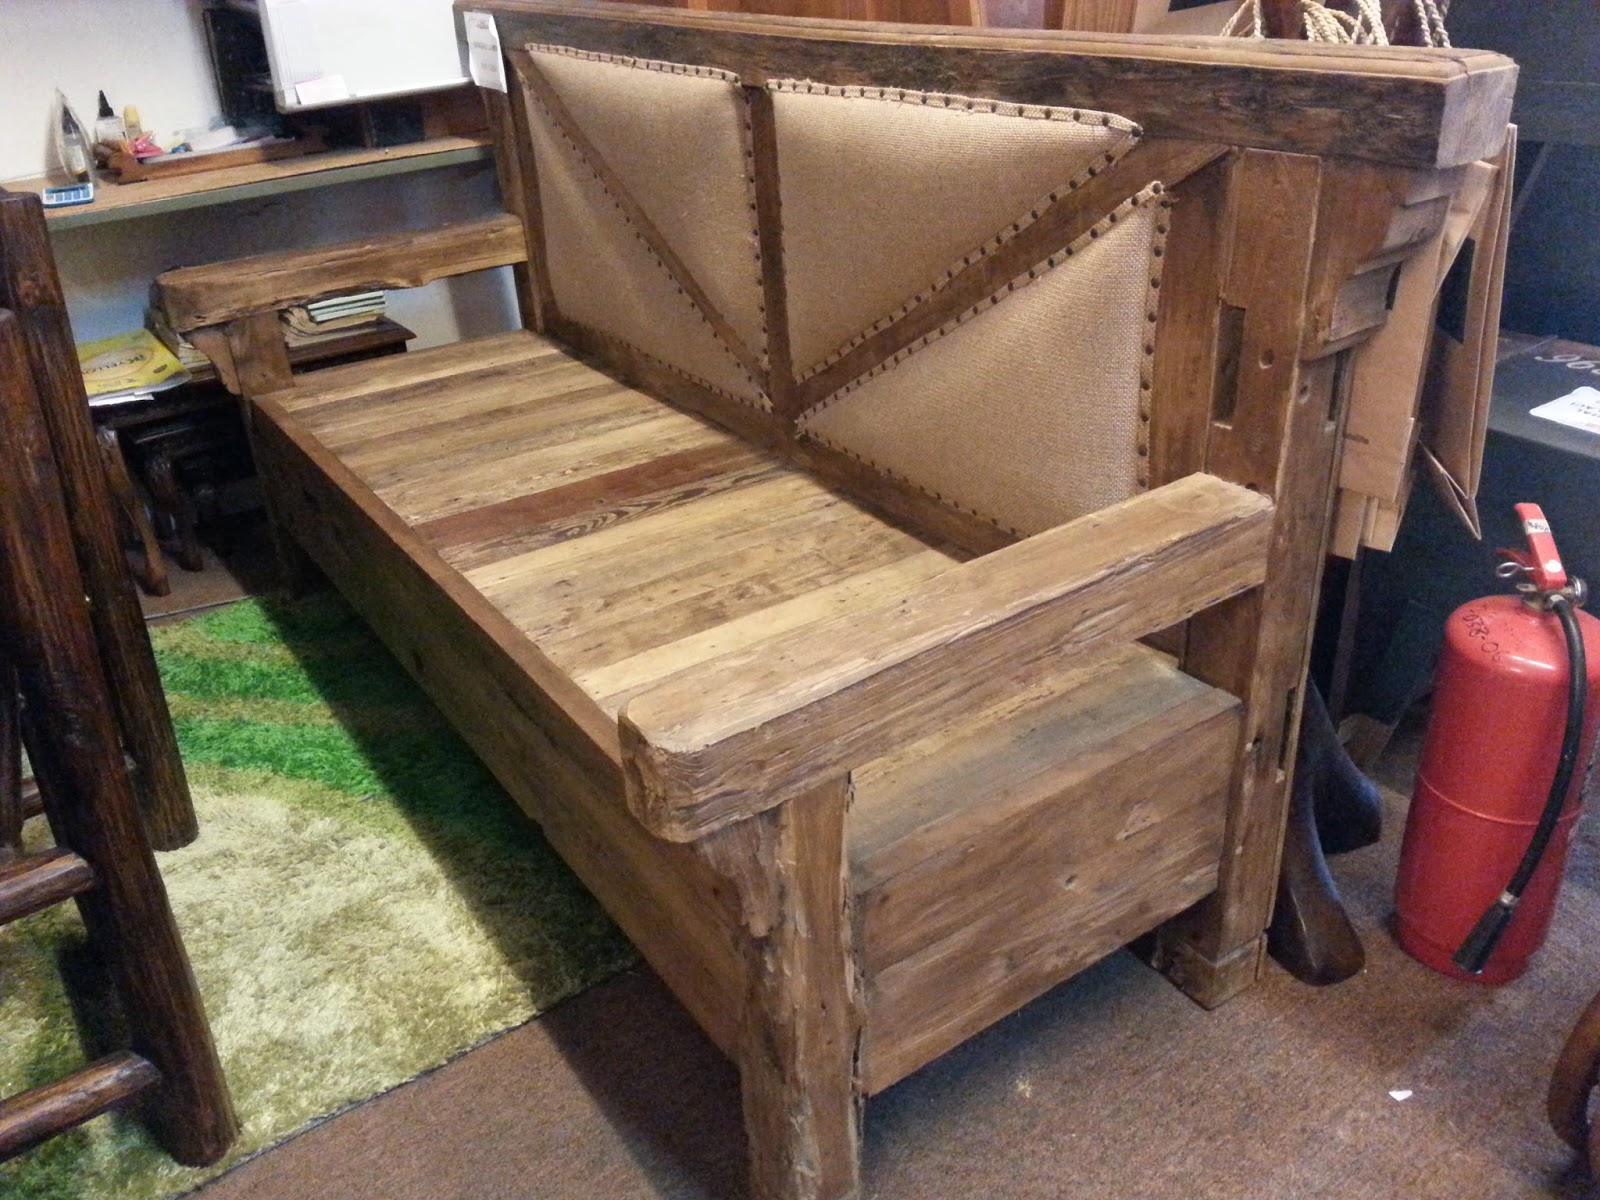 833 Imported Used Hand Made Teak Wood Kayu Jati Bench